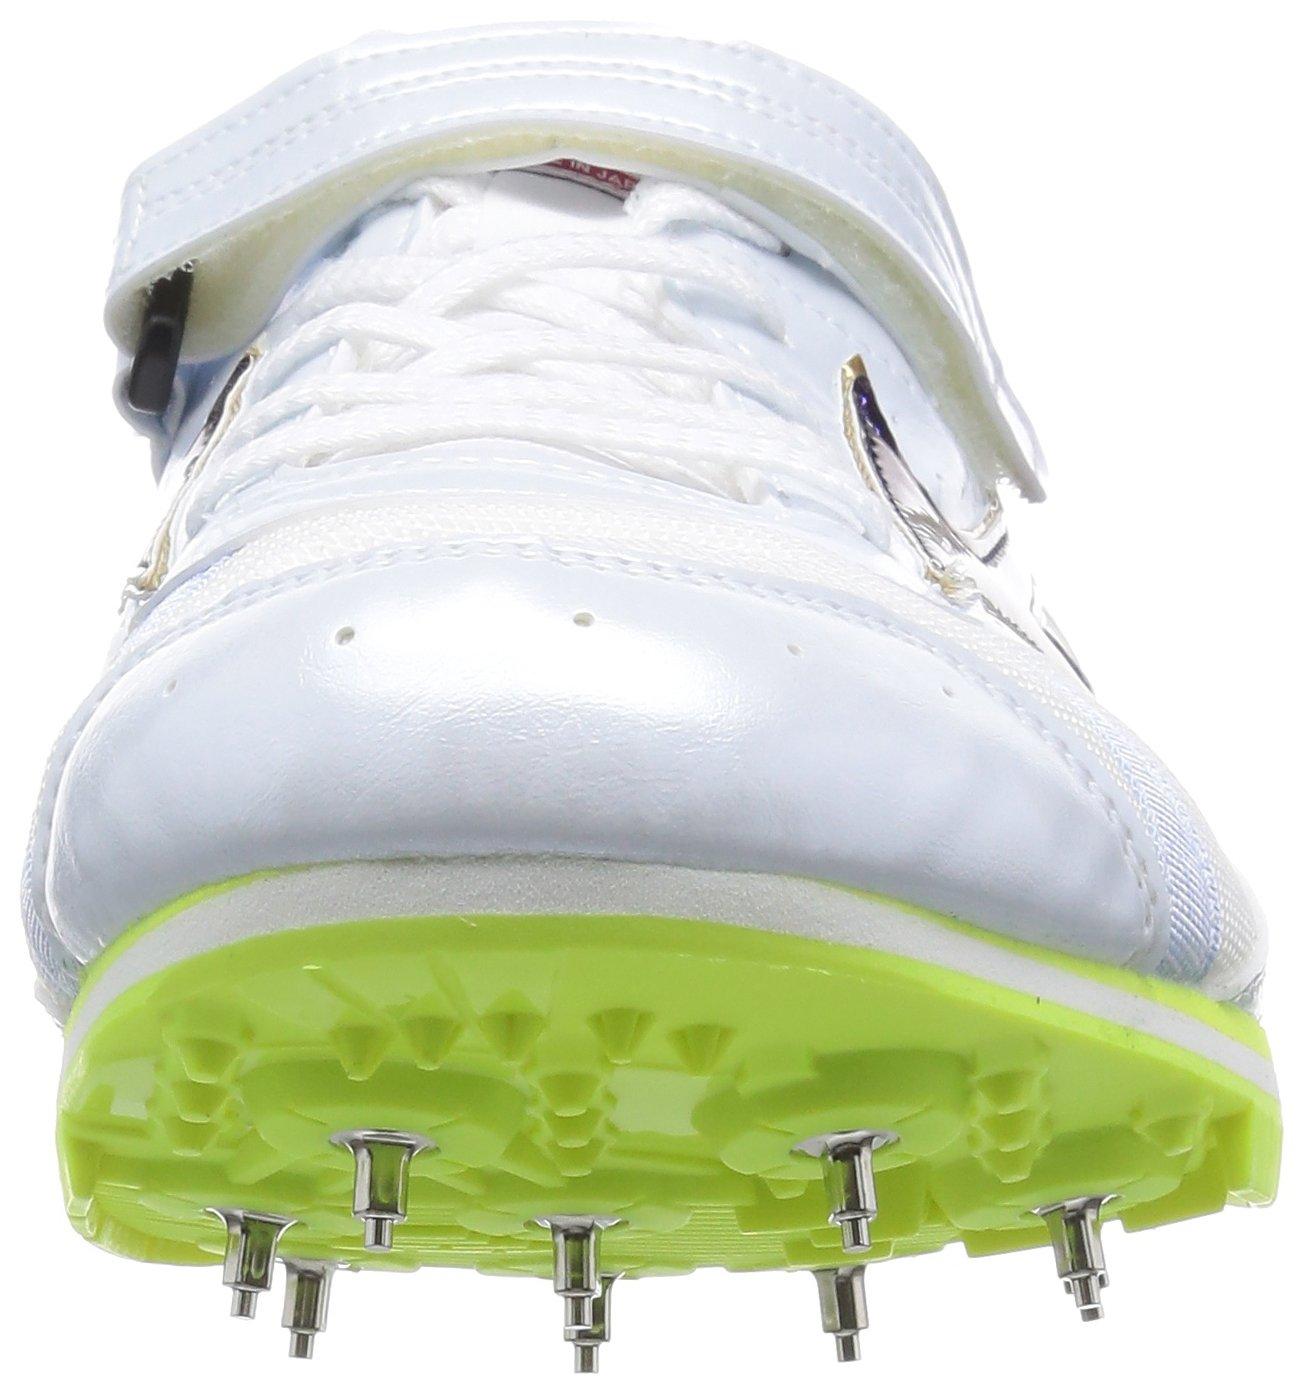 Mizuno Men's Field GEO LJ Track Shoes Yellow US 10.5 by Mizuno (Image #4)